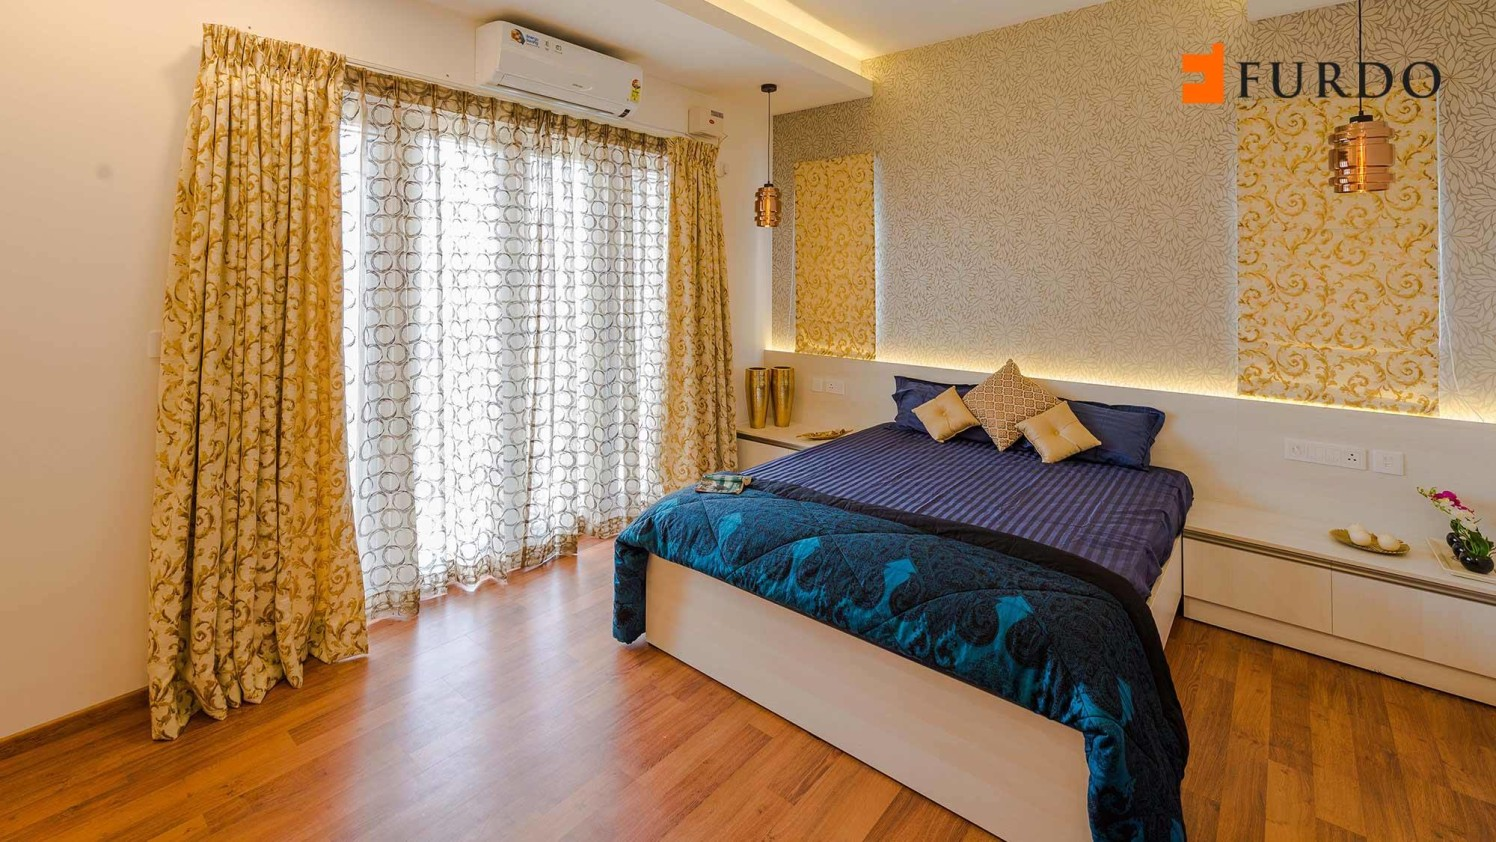 Bedroom With Artistic Wall Art  and wooden flooring by Furdo.com Bedroom Contemporary   Interior Design Photos & Ideas